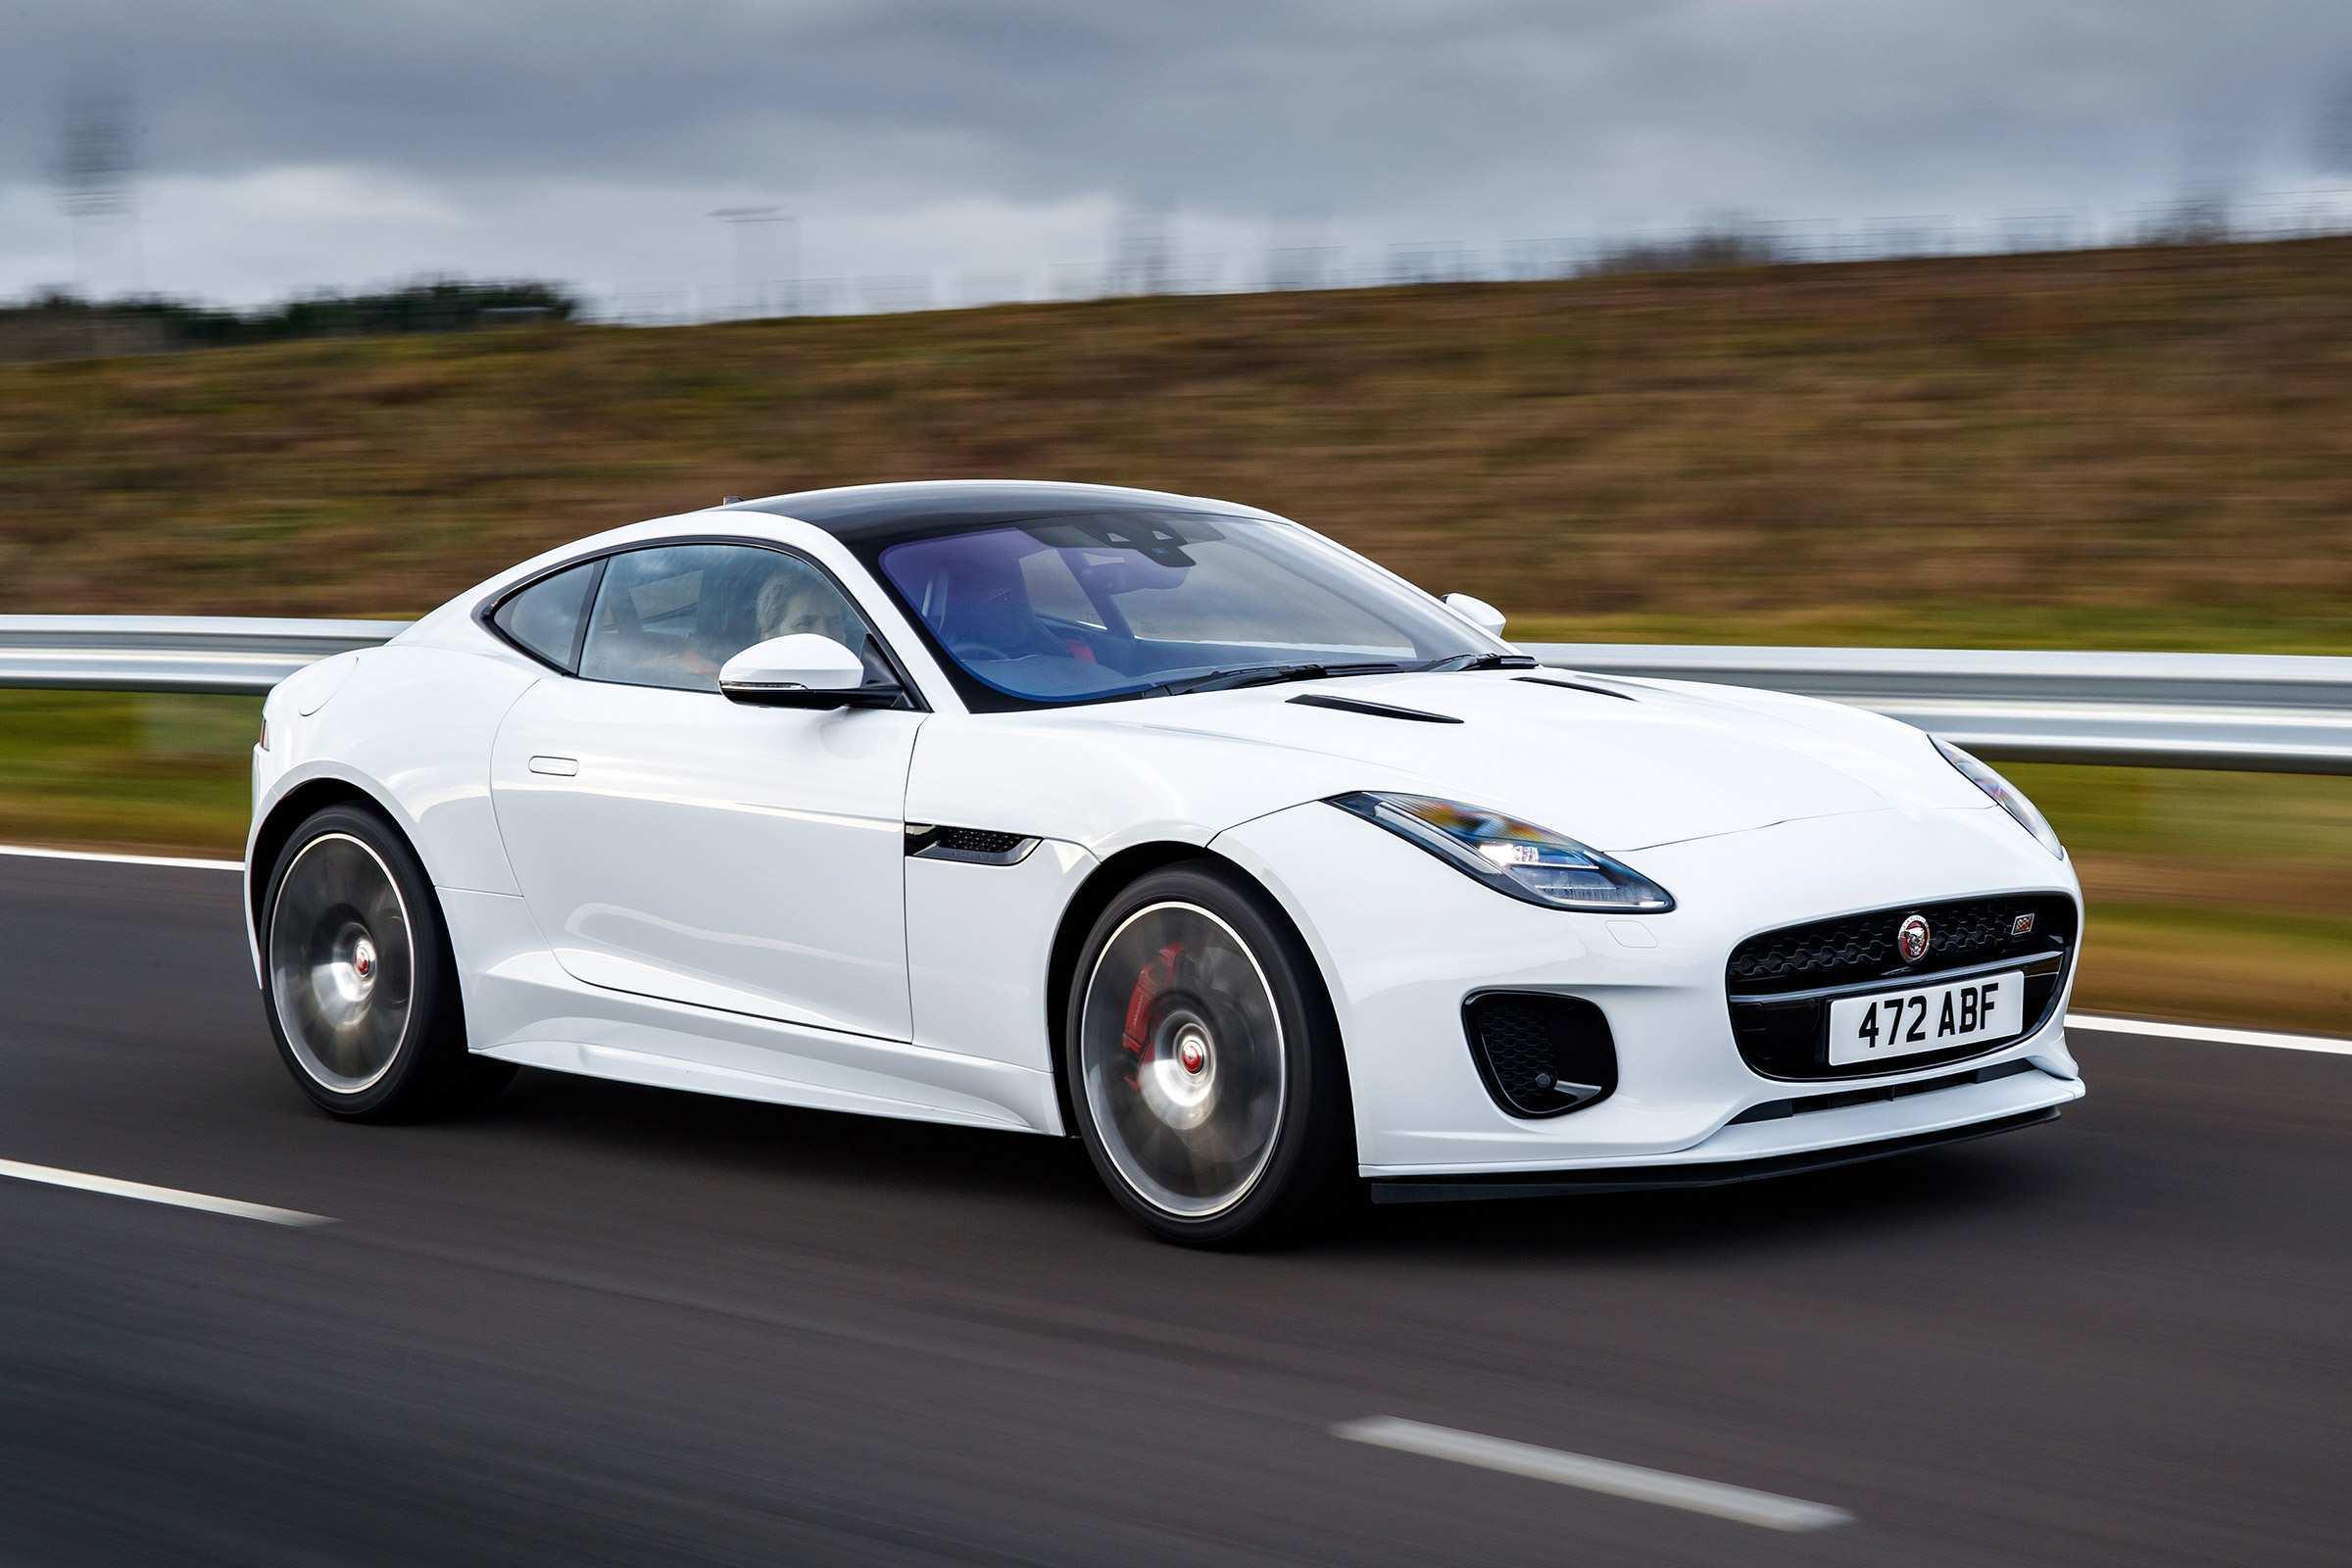 55 Gallery of Jaguar F Type 2019 Review Price for Jaguar F Type 2019 Review